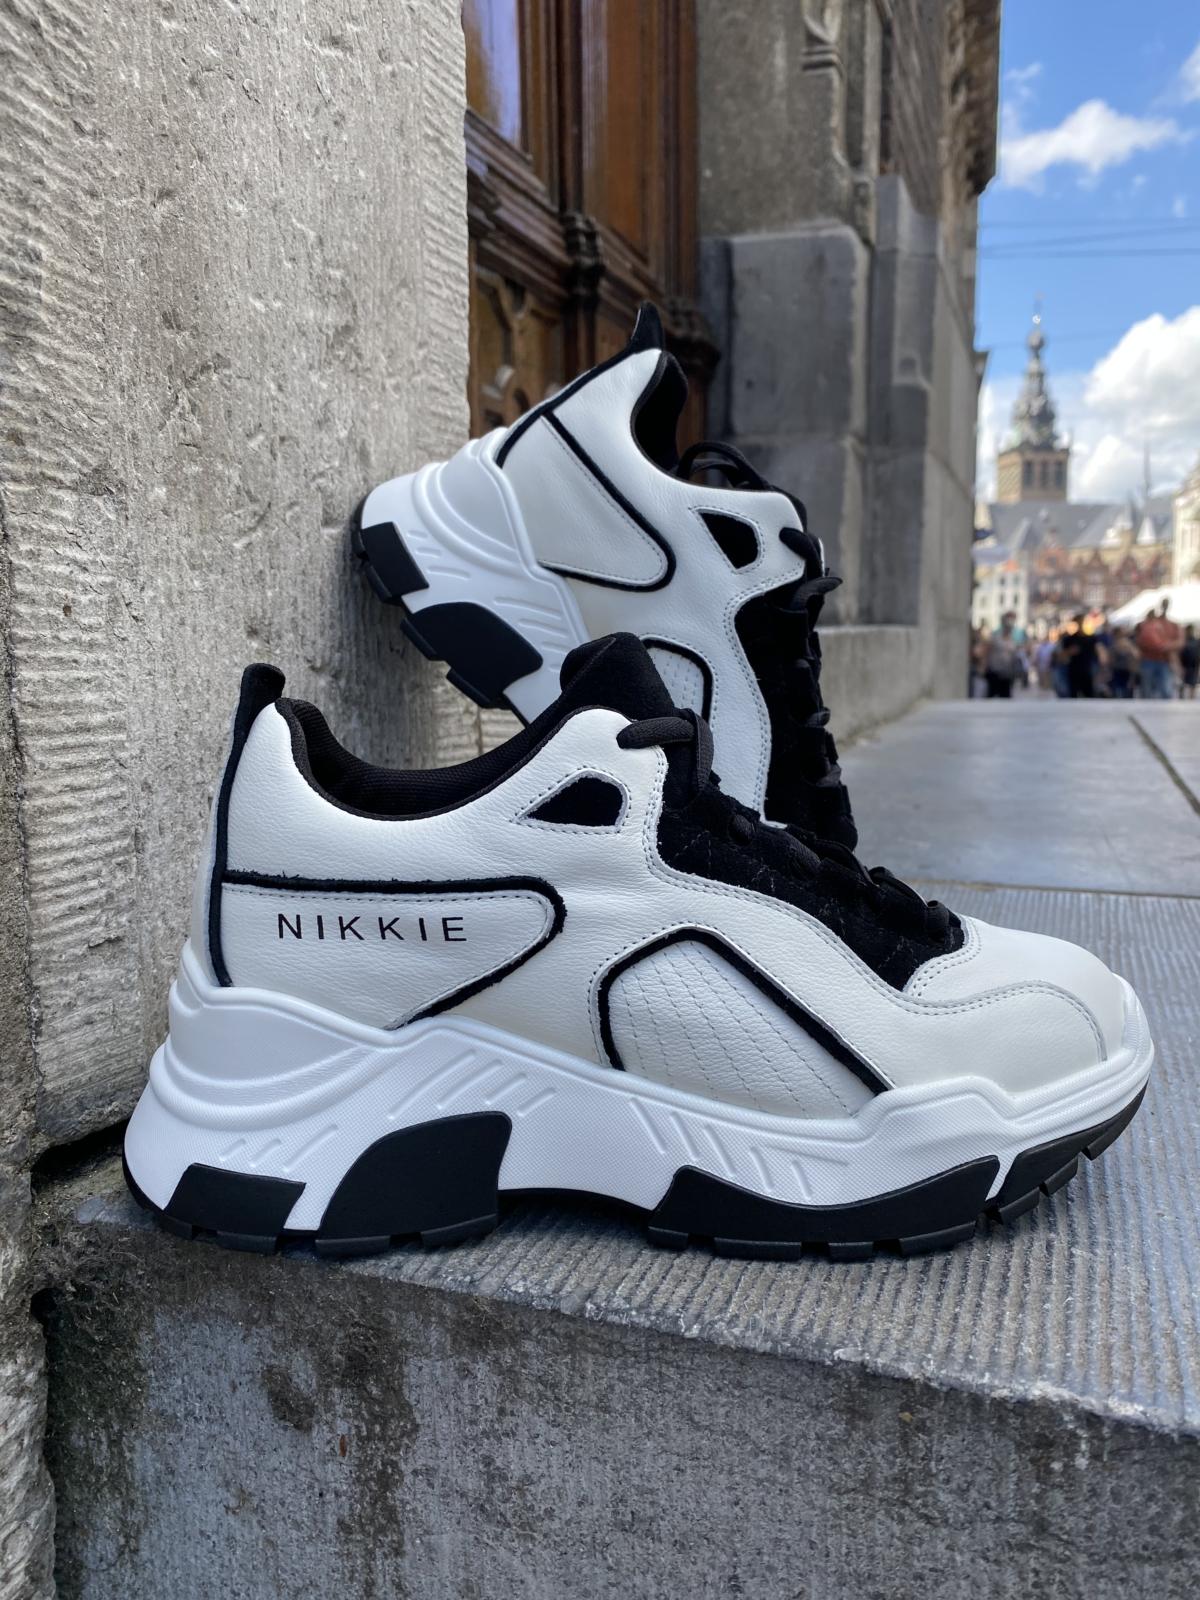 Nikkie sneakers 👟white / BLACK New